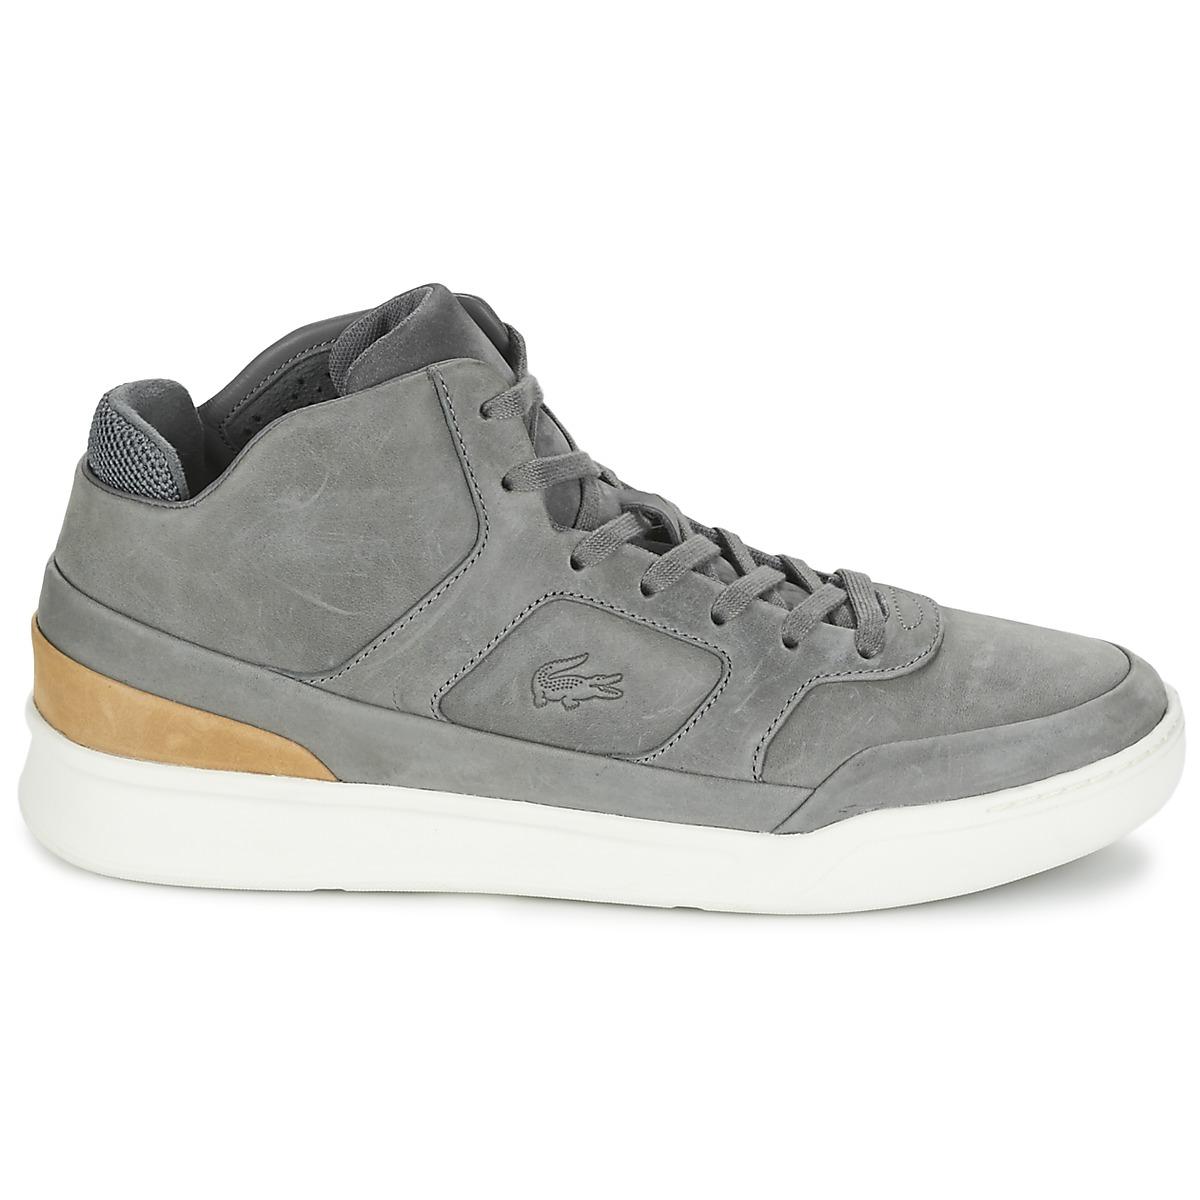 d07ea719914 Ψηλά Sneakers Lacoste EXPLORATEUR MID 316 2, ΑΝΔΡΑΣ | ΠΑΠΟΥΤΣΙΑ | SNEAKERS